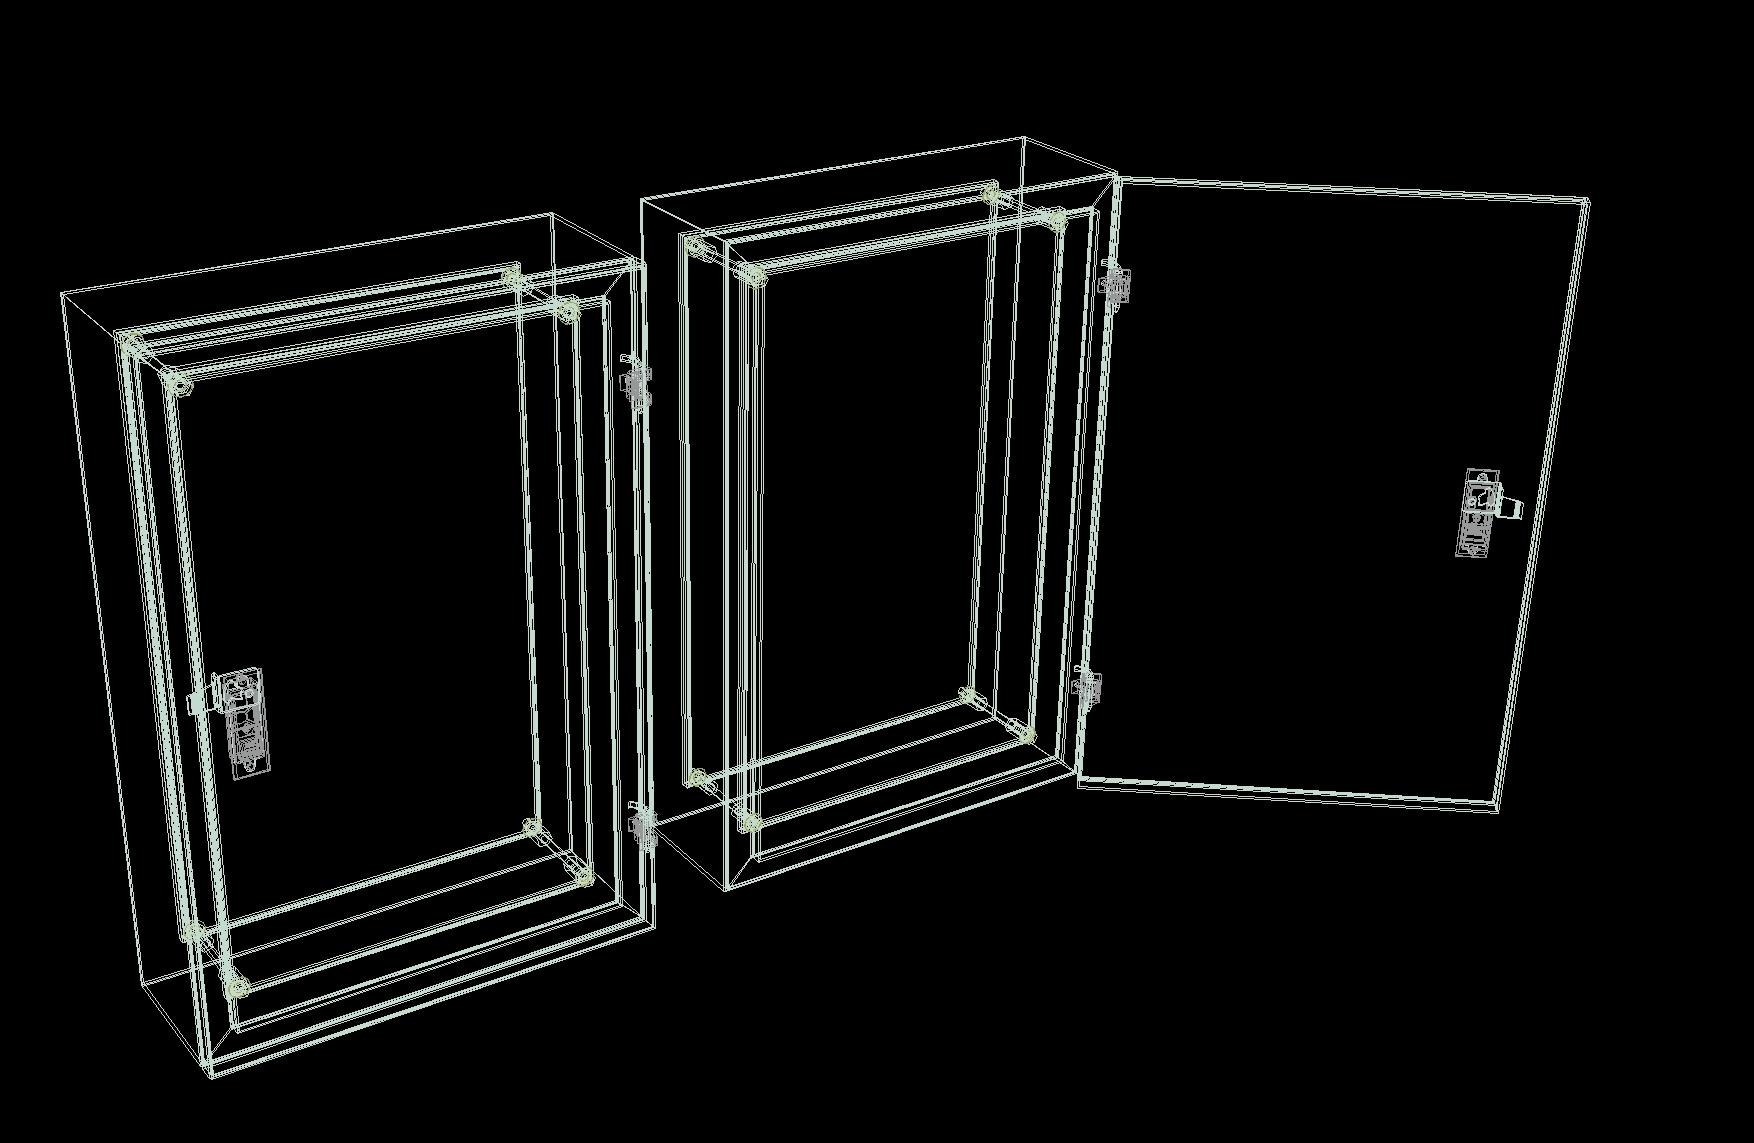 Box Panel Listrik 3d Dwg Model For Autocad Designs Cad